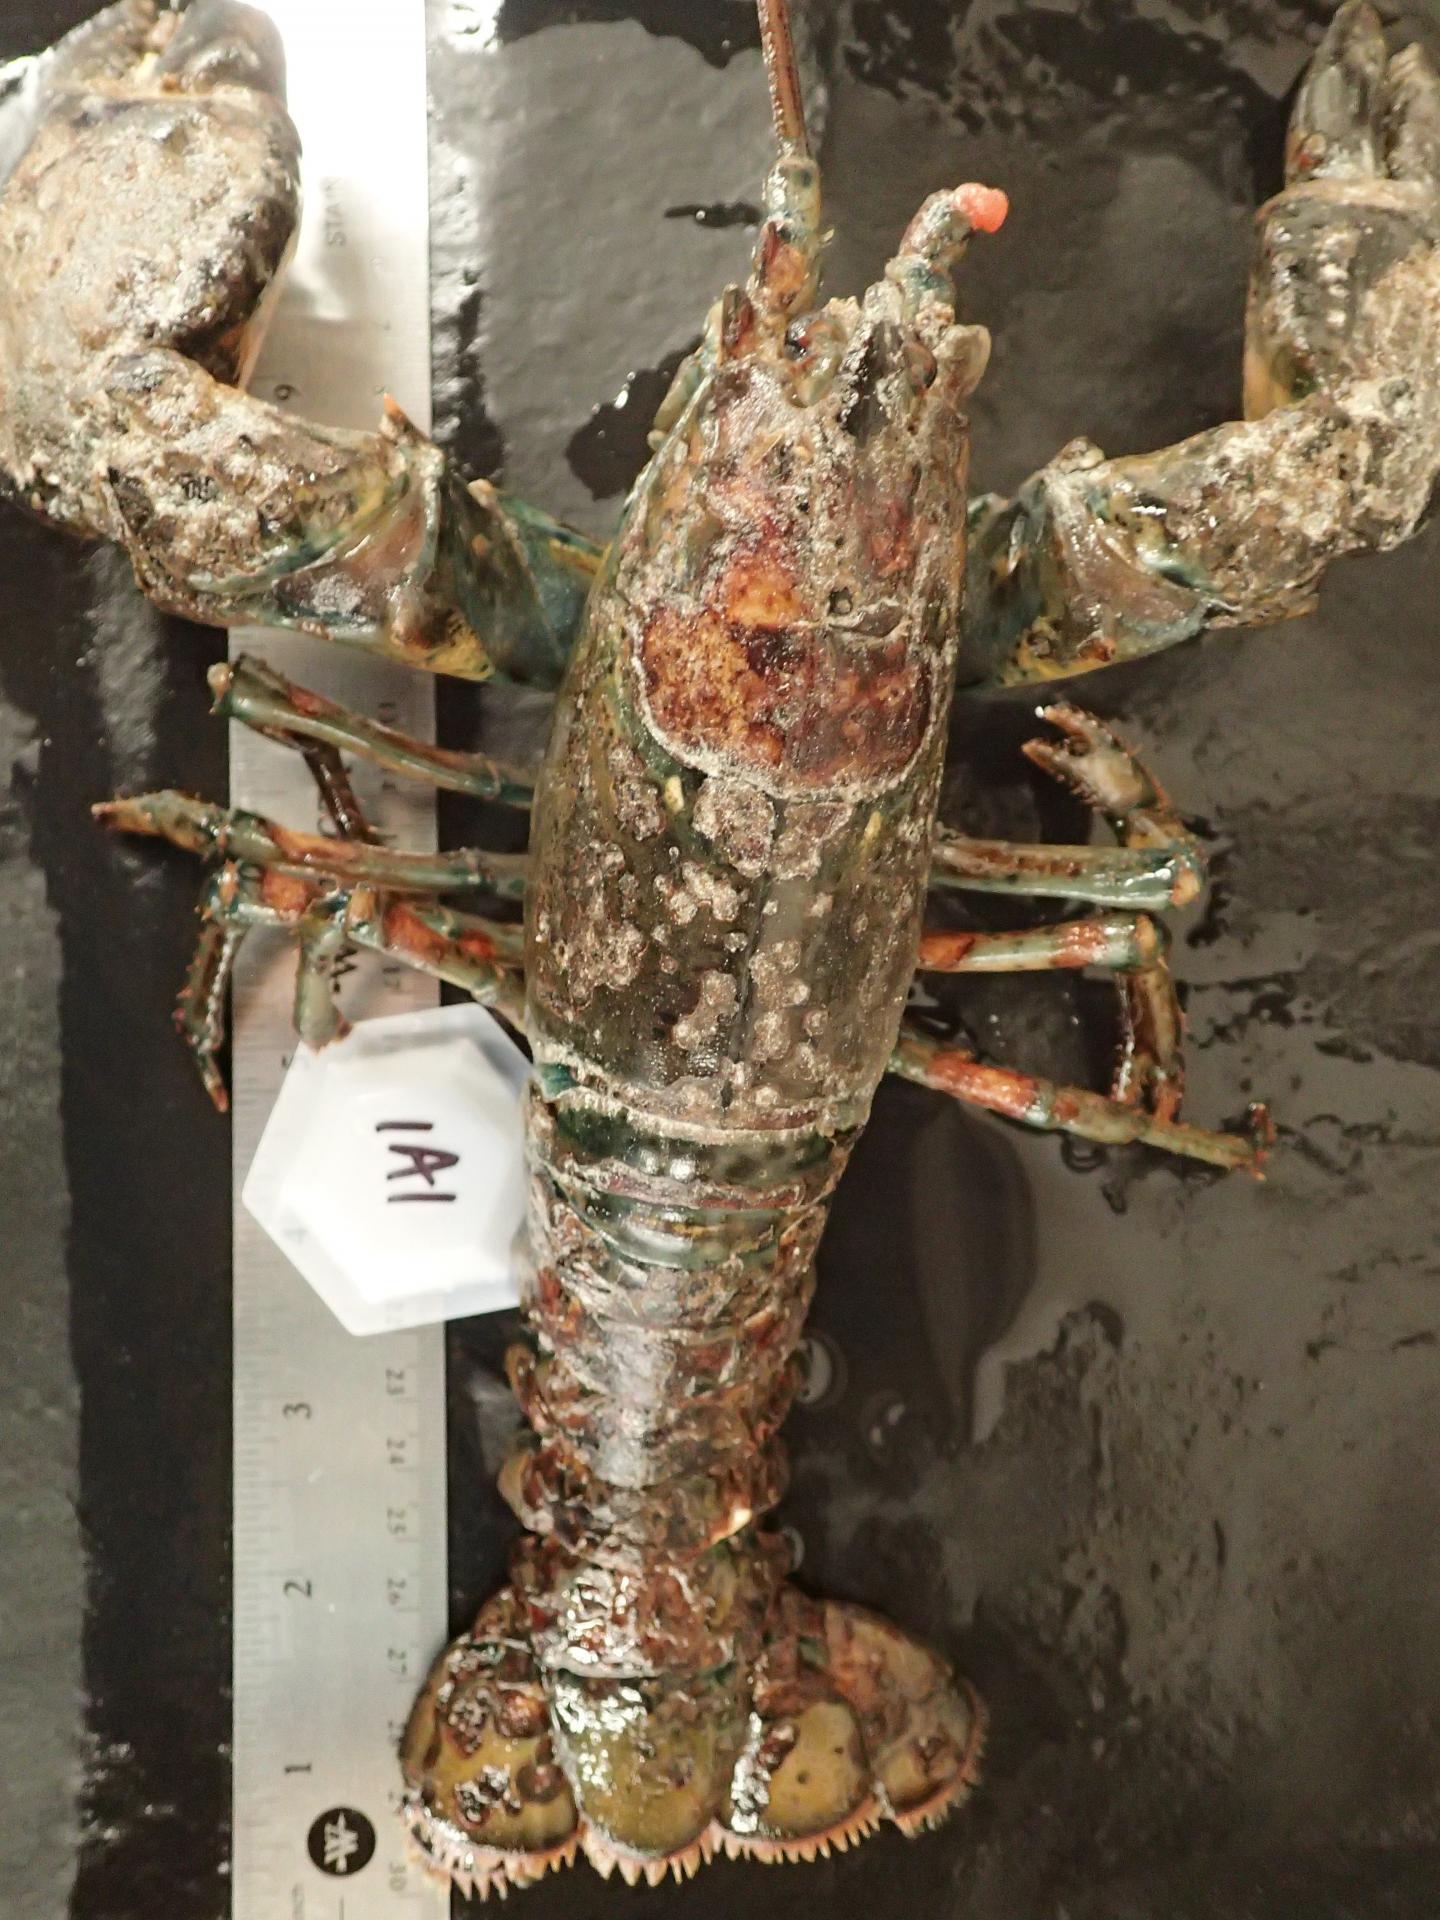 Sick Lobster